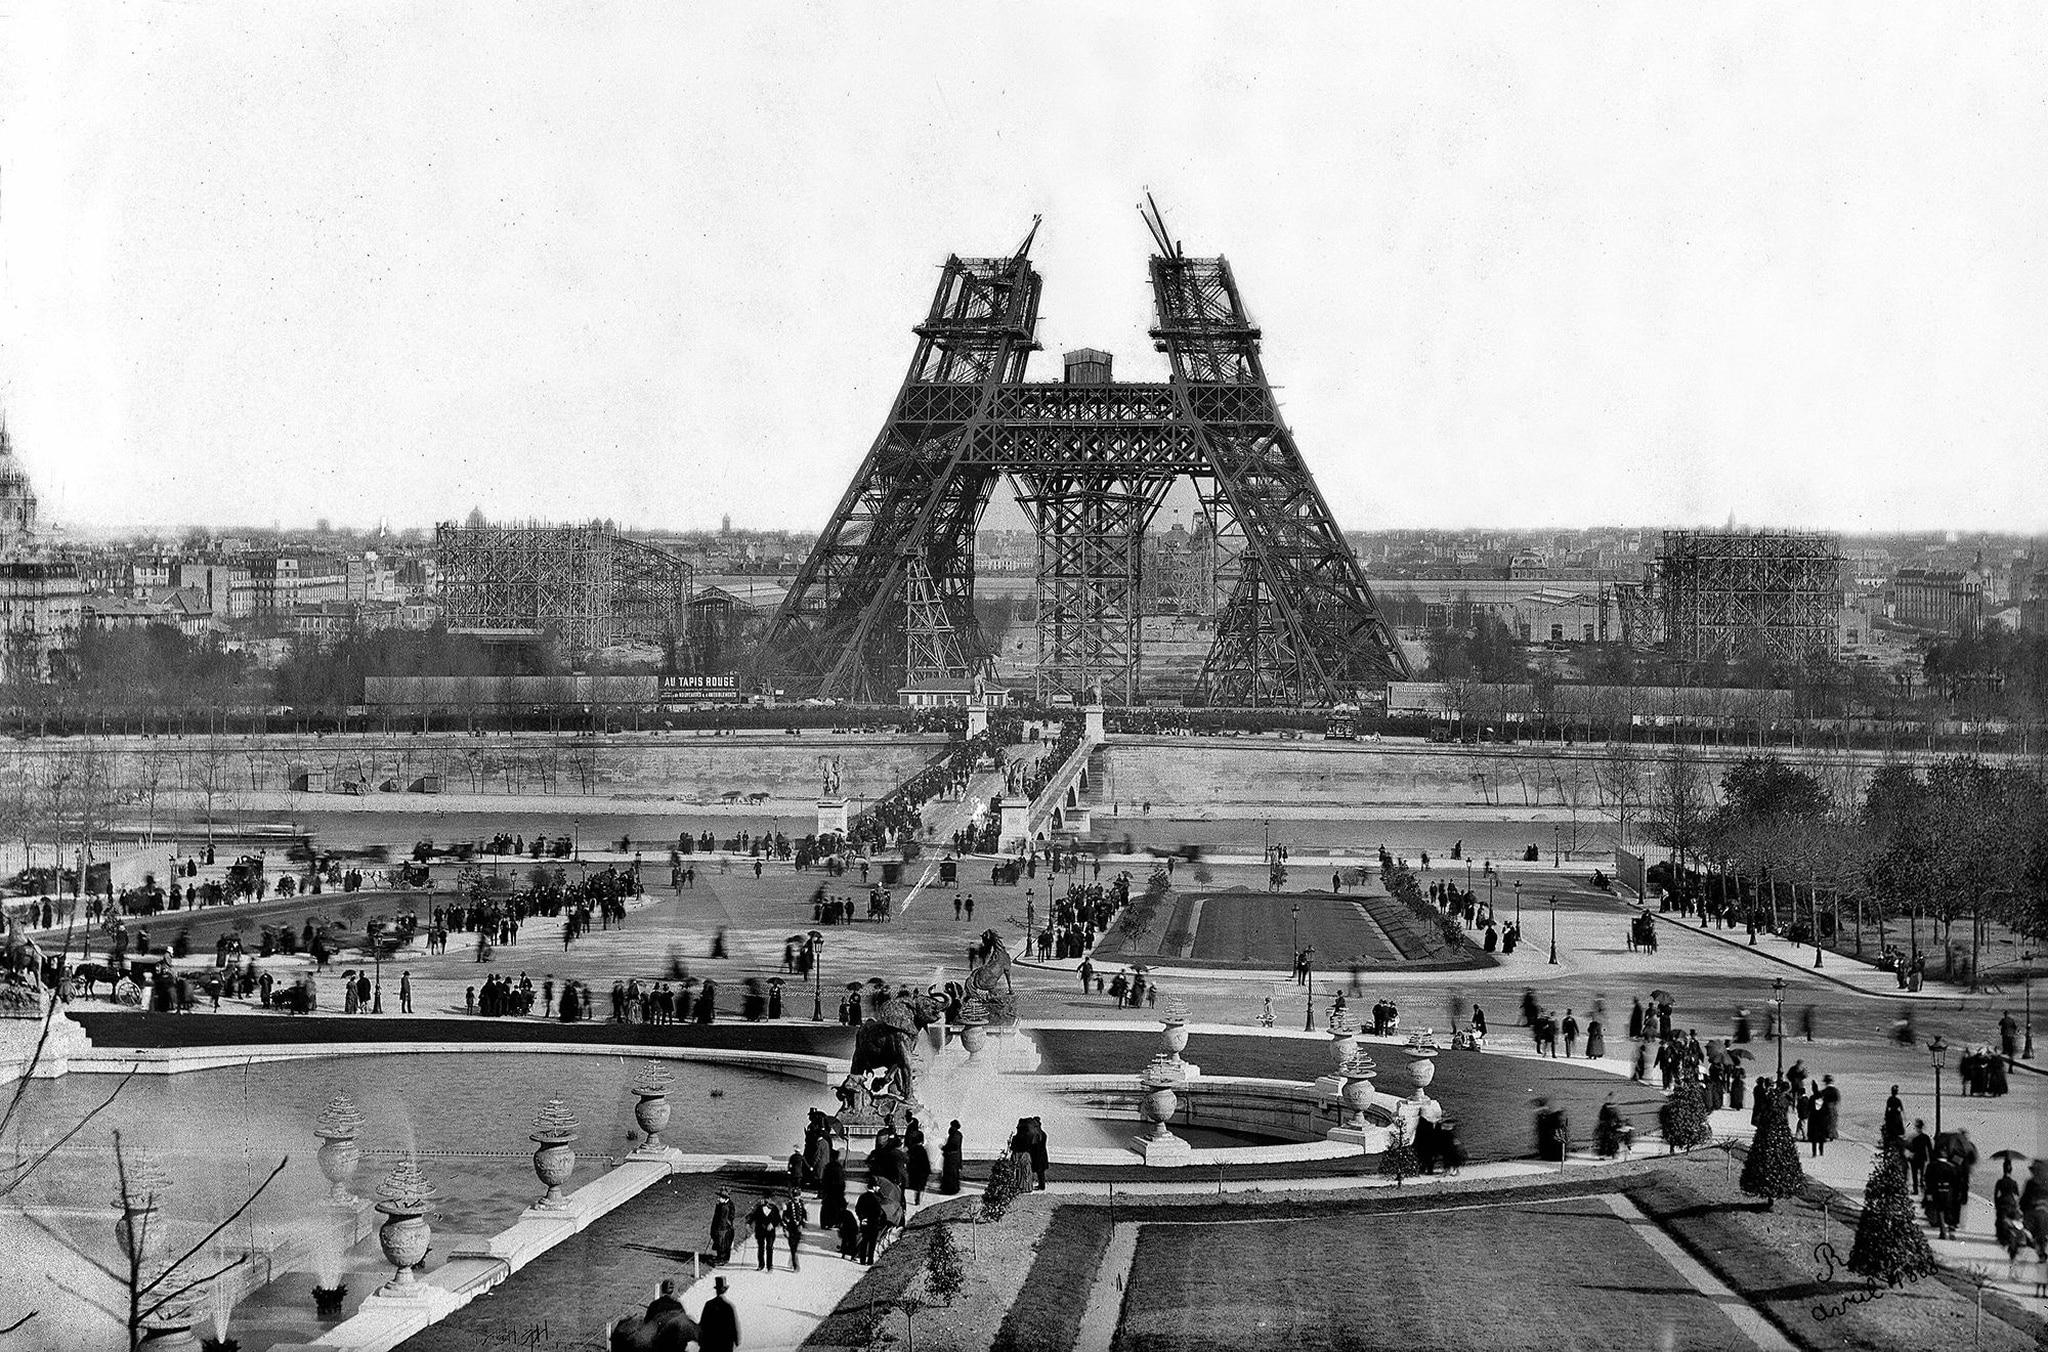 Historia de la Torre Eiffel